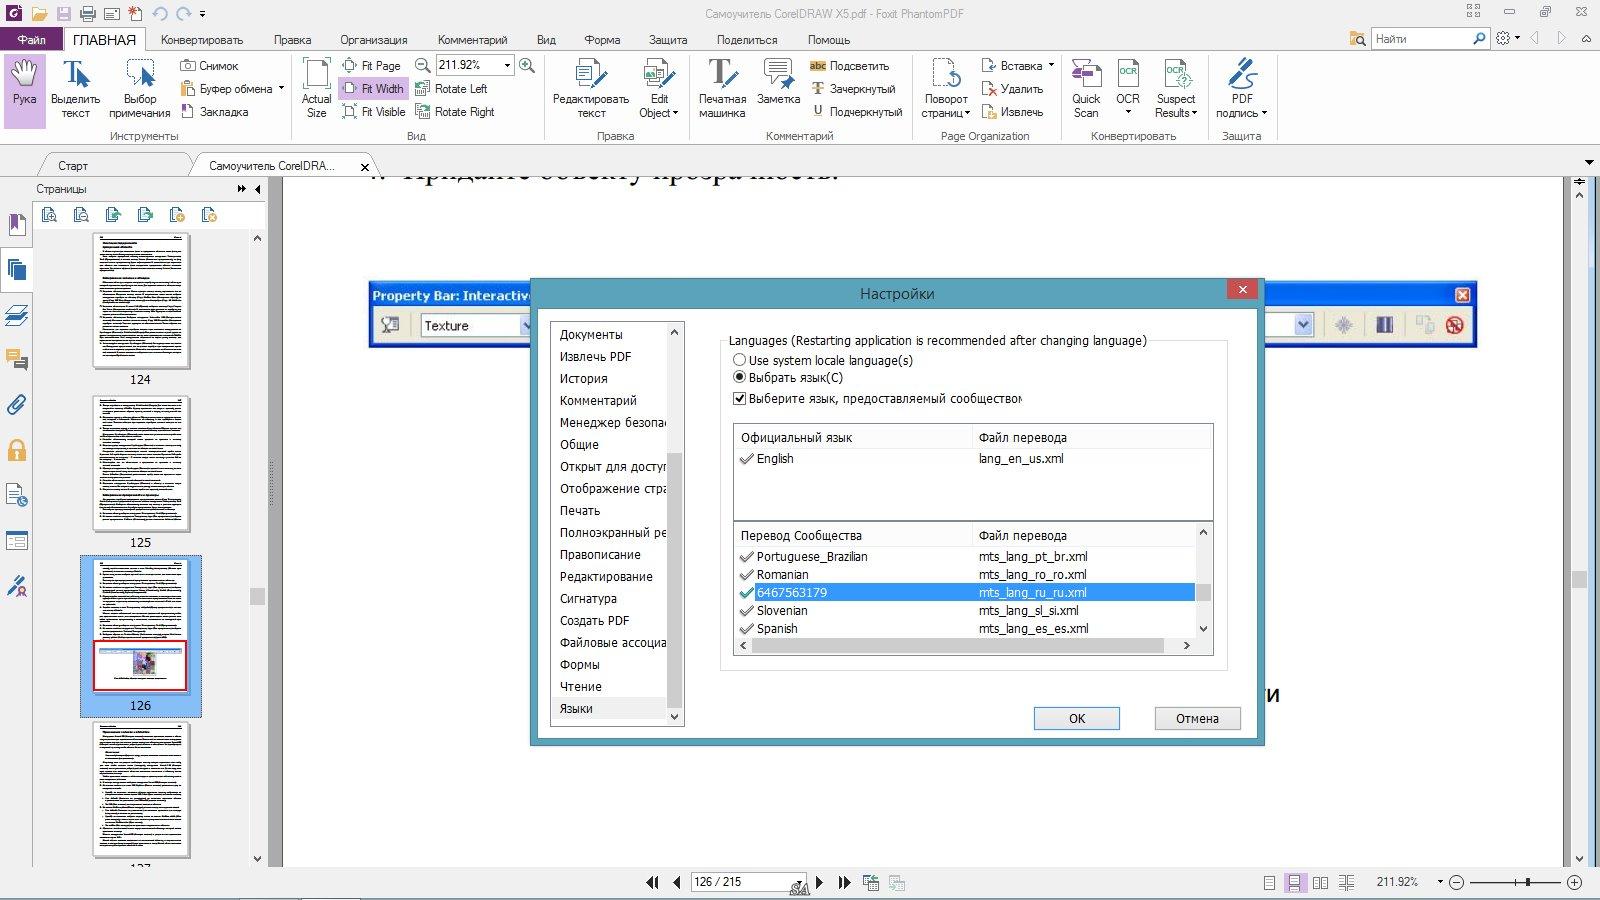 Foxit Phantom Reader 9.7.1 Crack + Serial Key Free Download